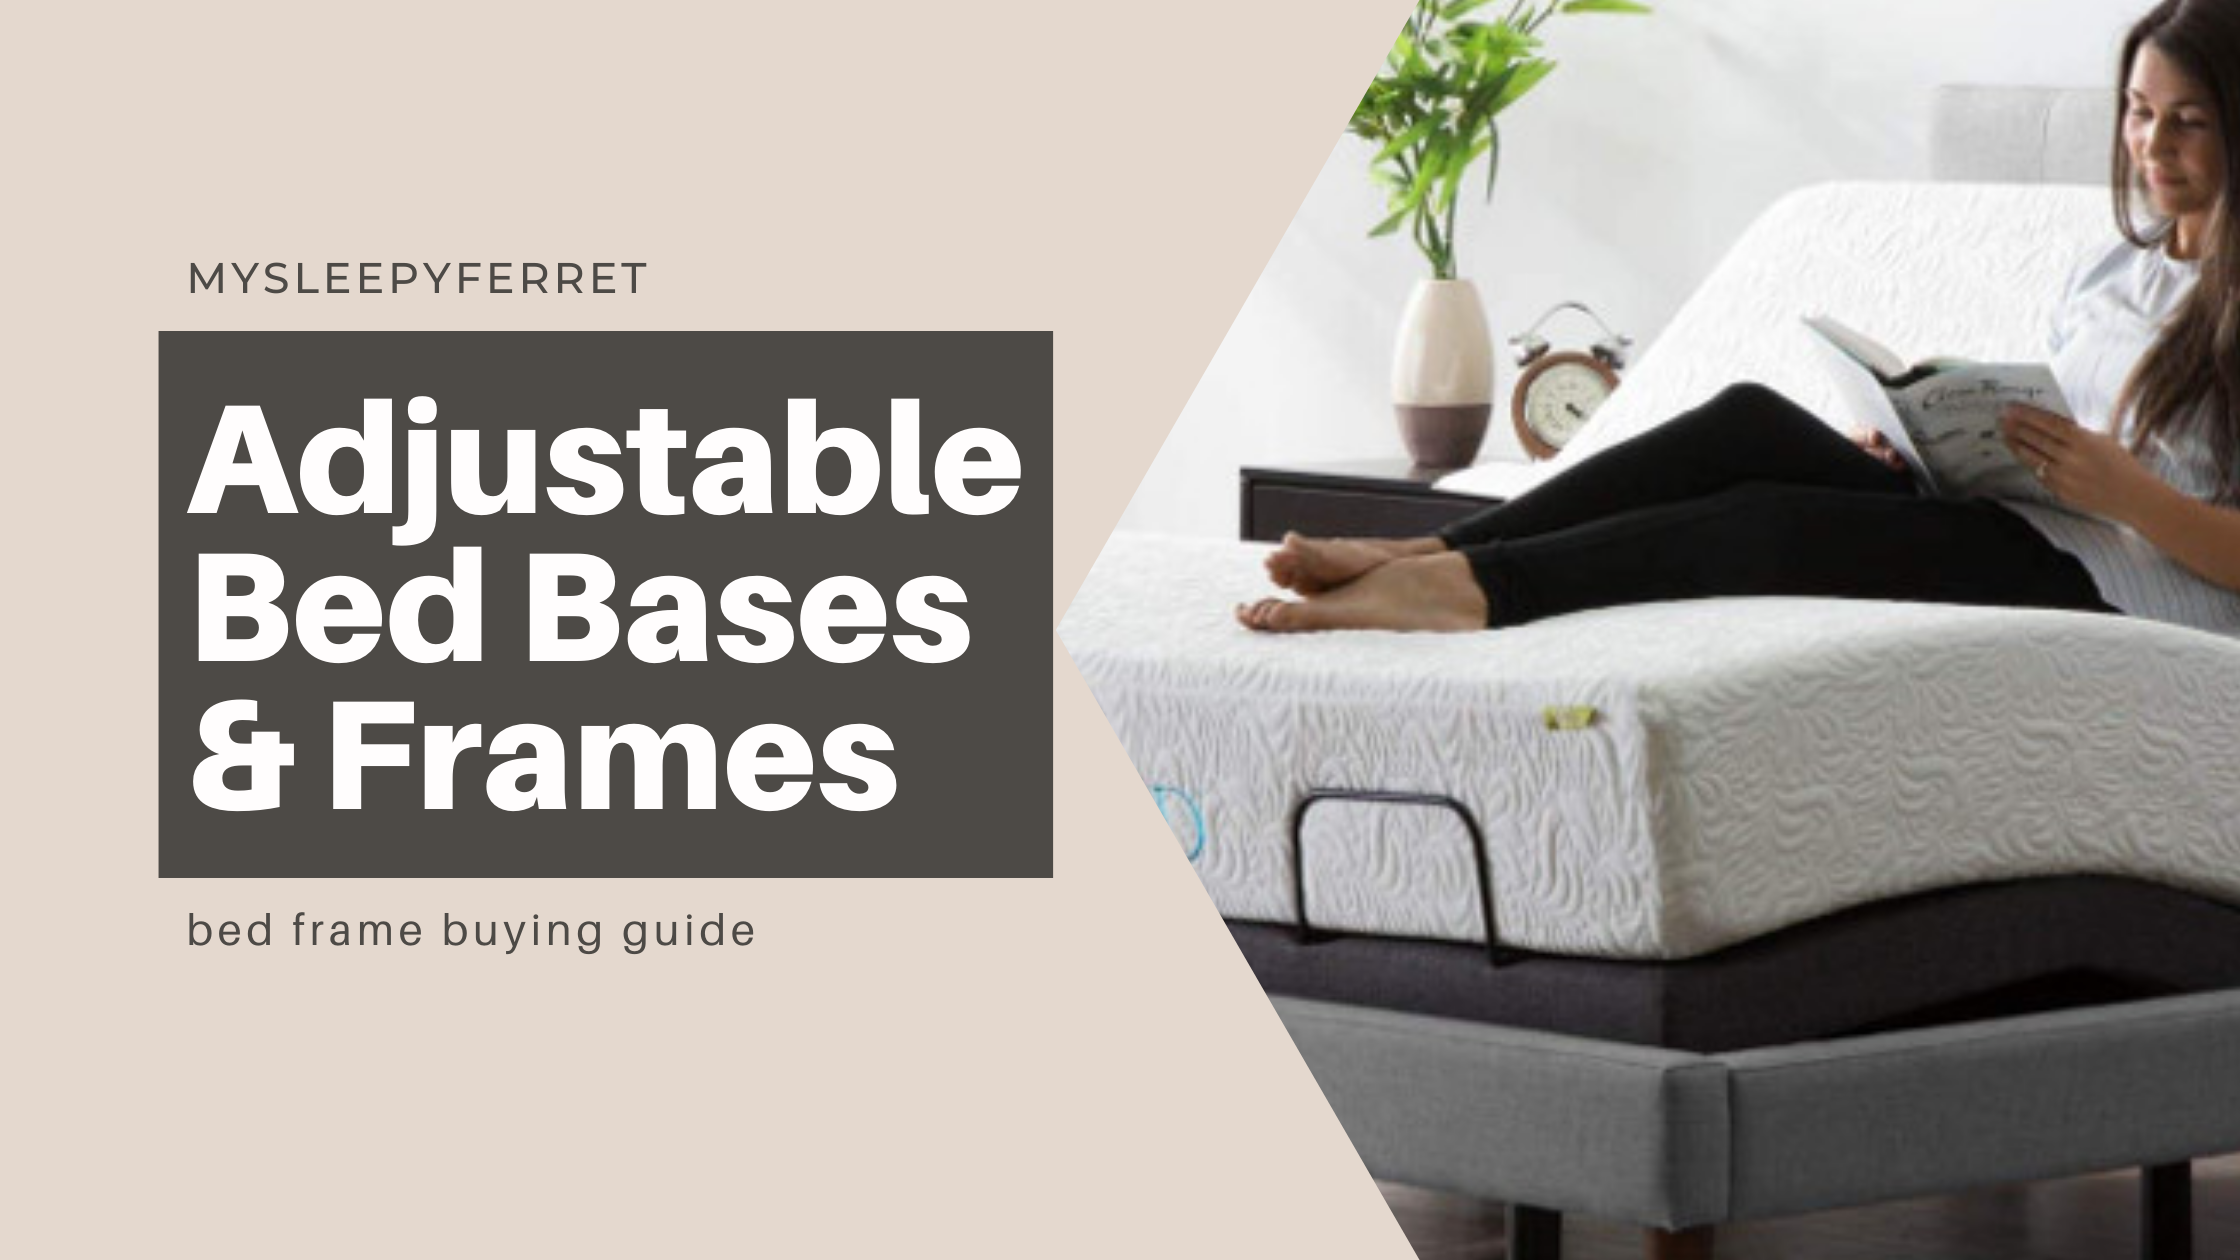 7 Best Adjustable Bed Frames (Bases) for Luxury Sleep